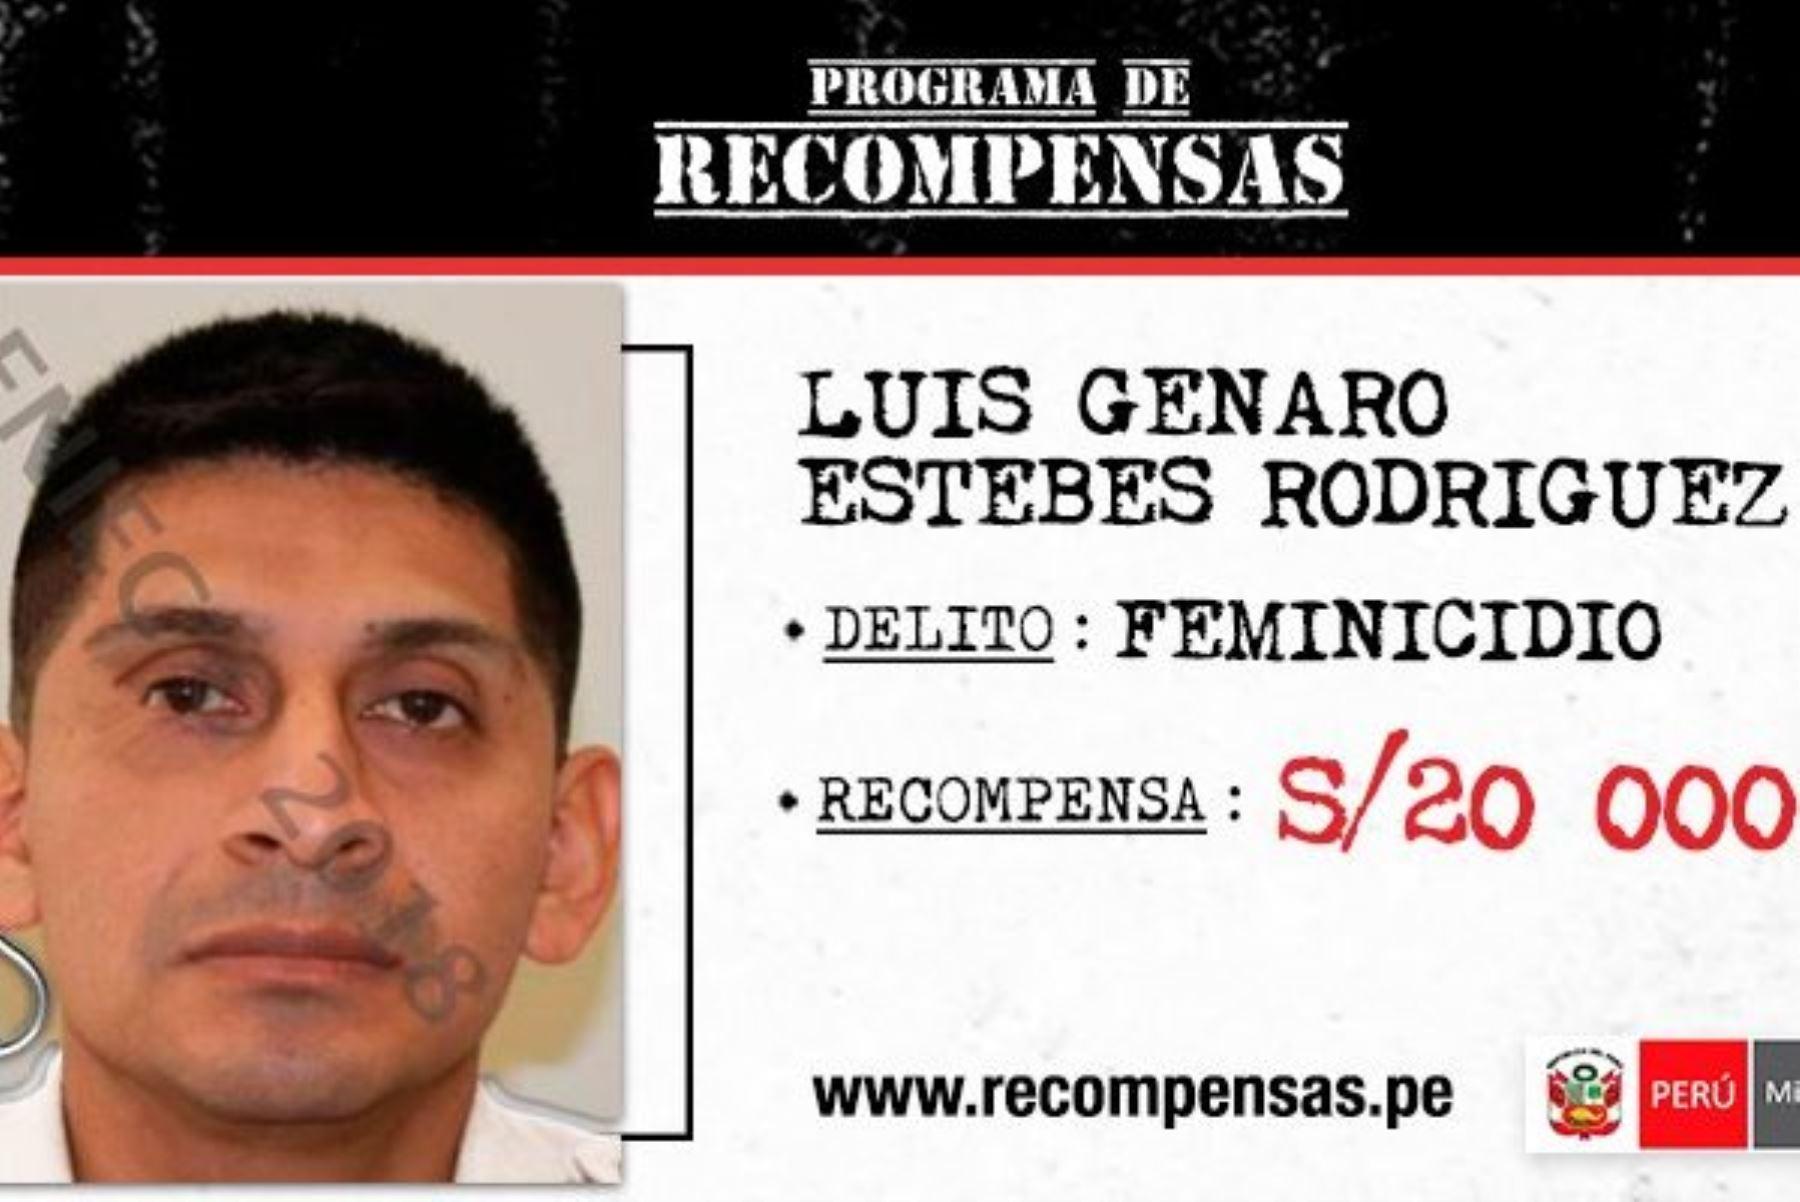 Incluyen en Programa de Recompensas a presunto asesino de mujer hallada en cilindro. Foto: ANDINA/Difusión.